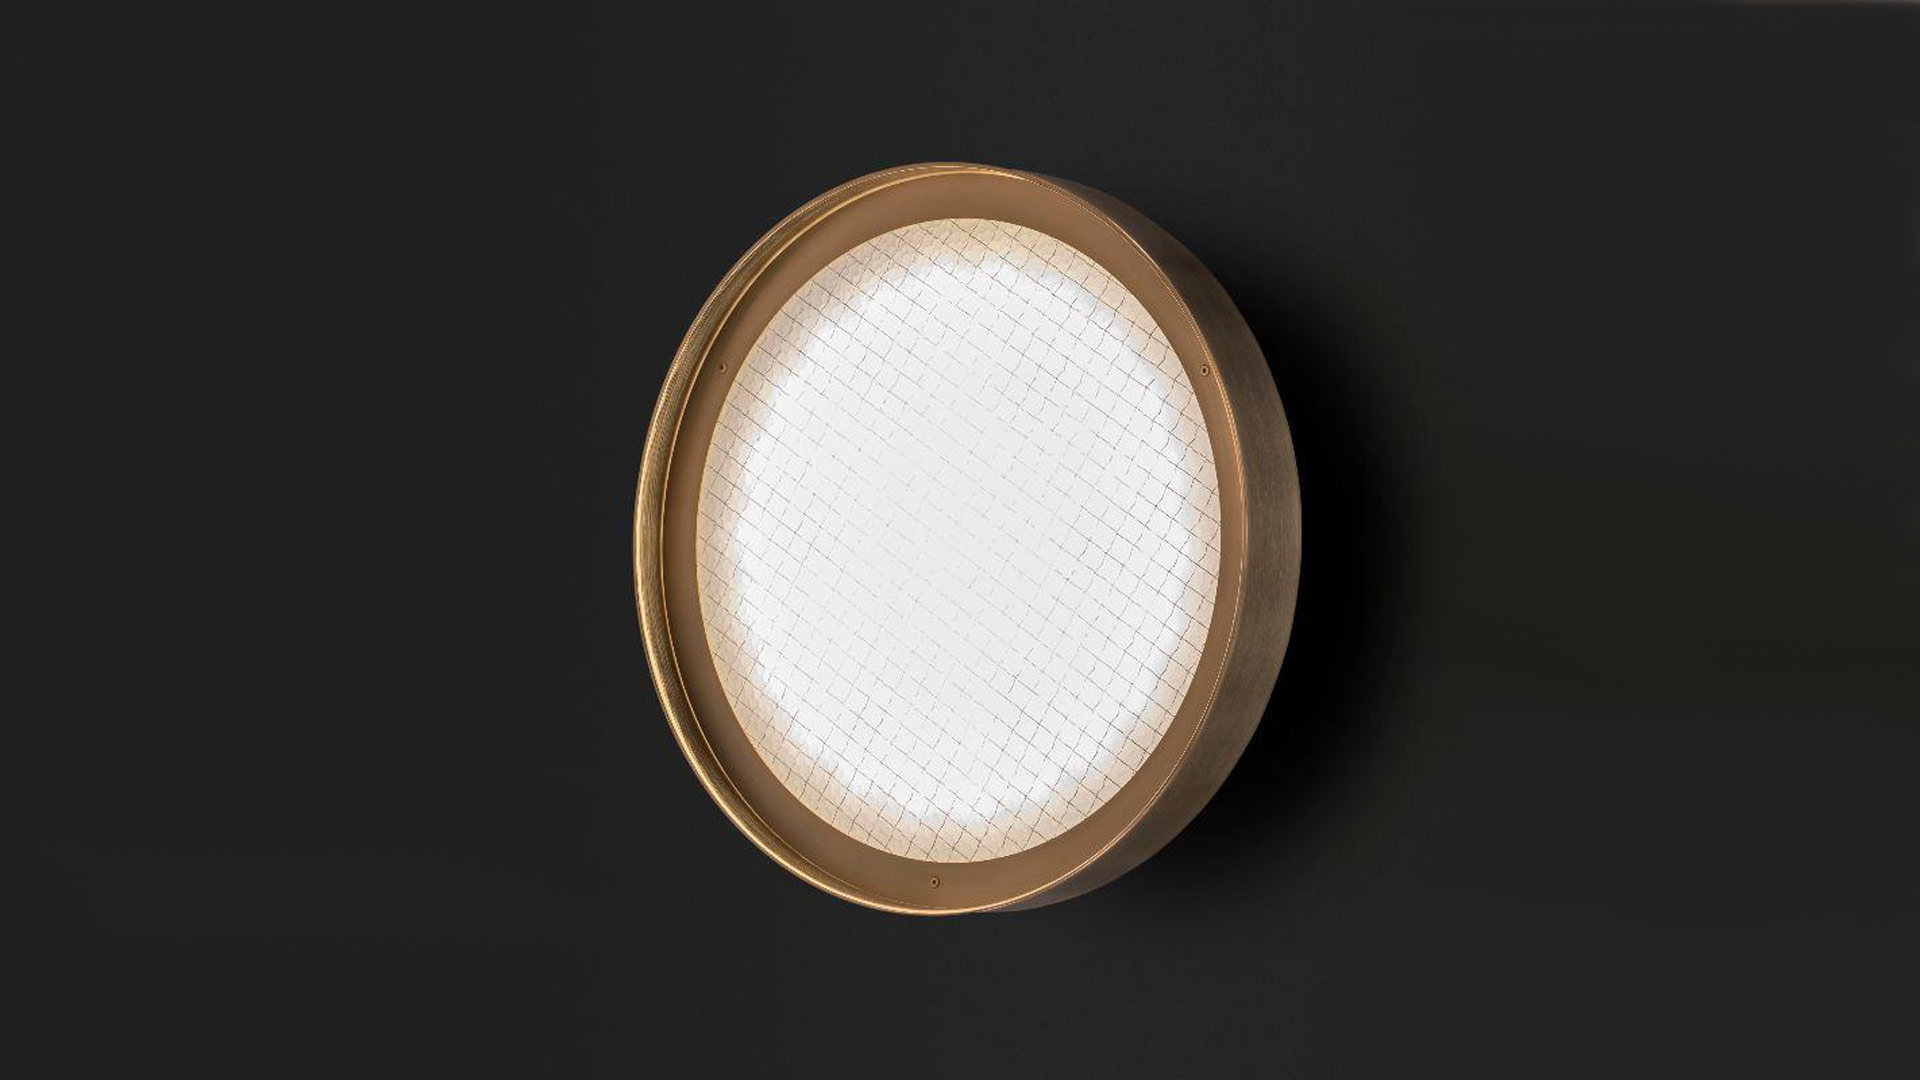 Focus on Berlin lamp/New dimension